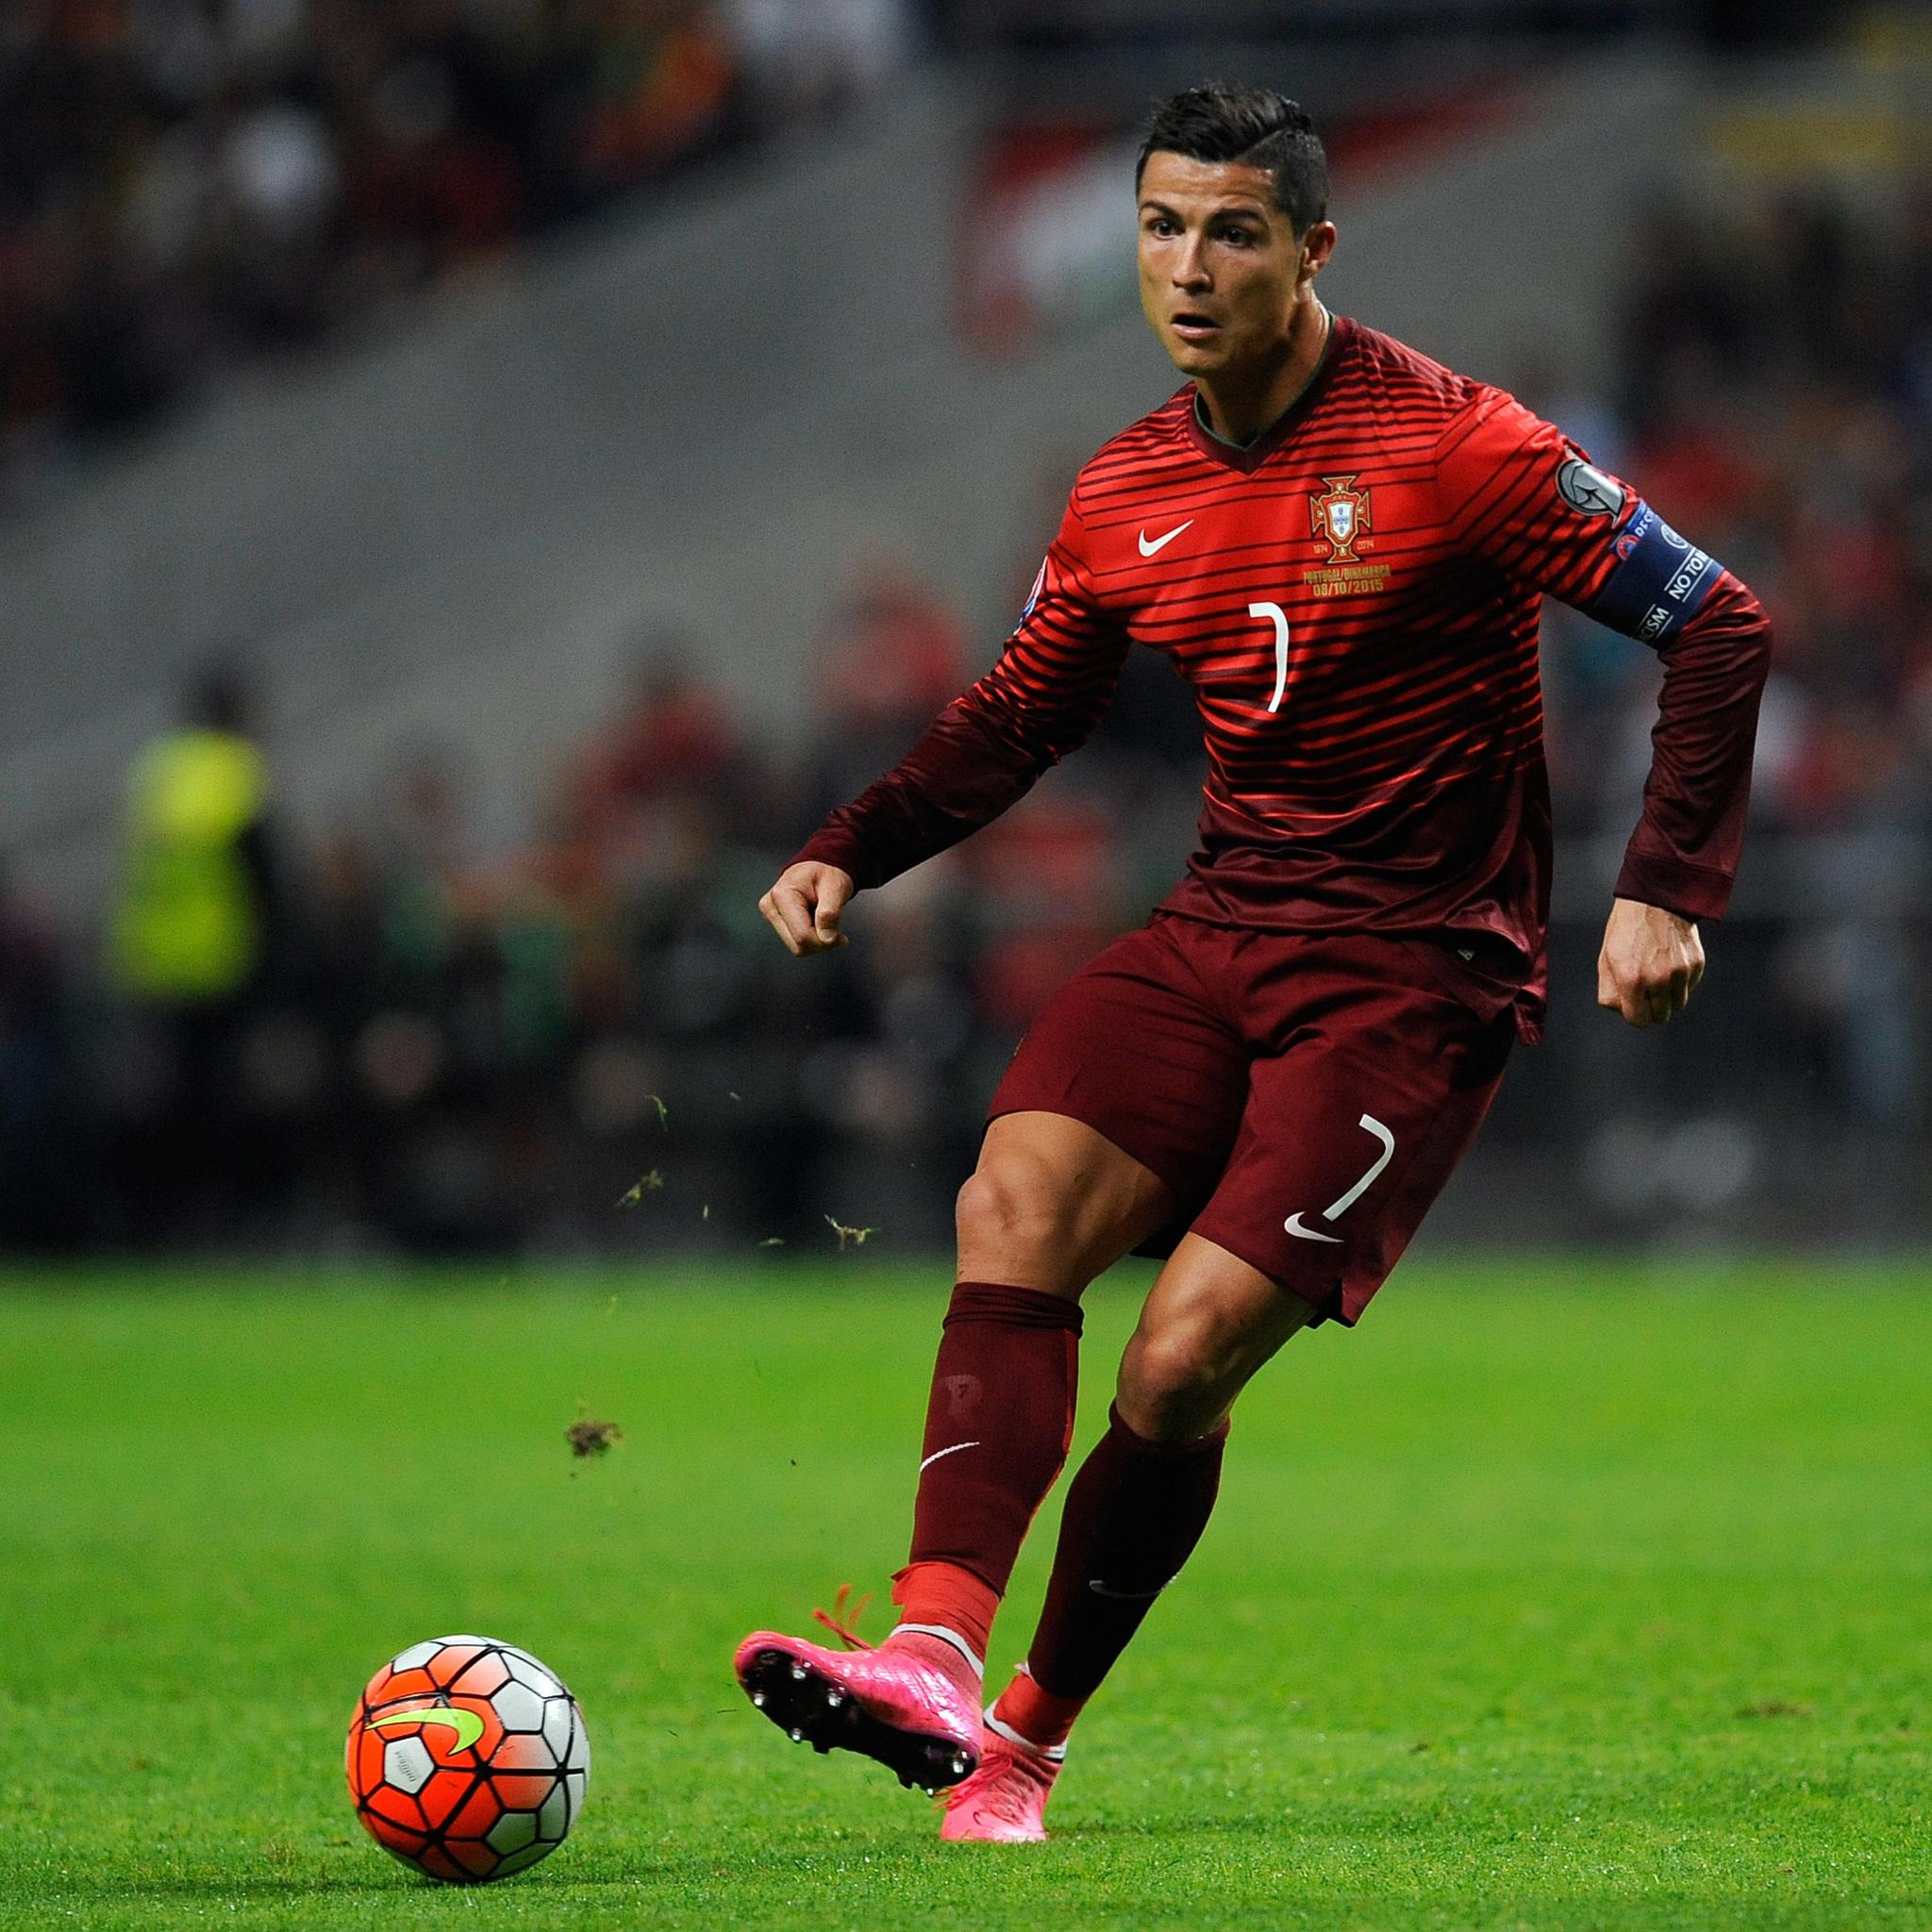 2048x2048 Cristiano Ronaldo Ipad Air HD 4k Wallpapers ...